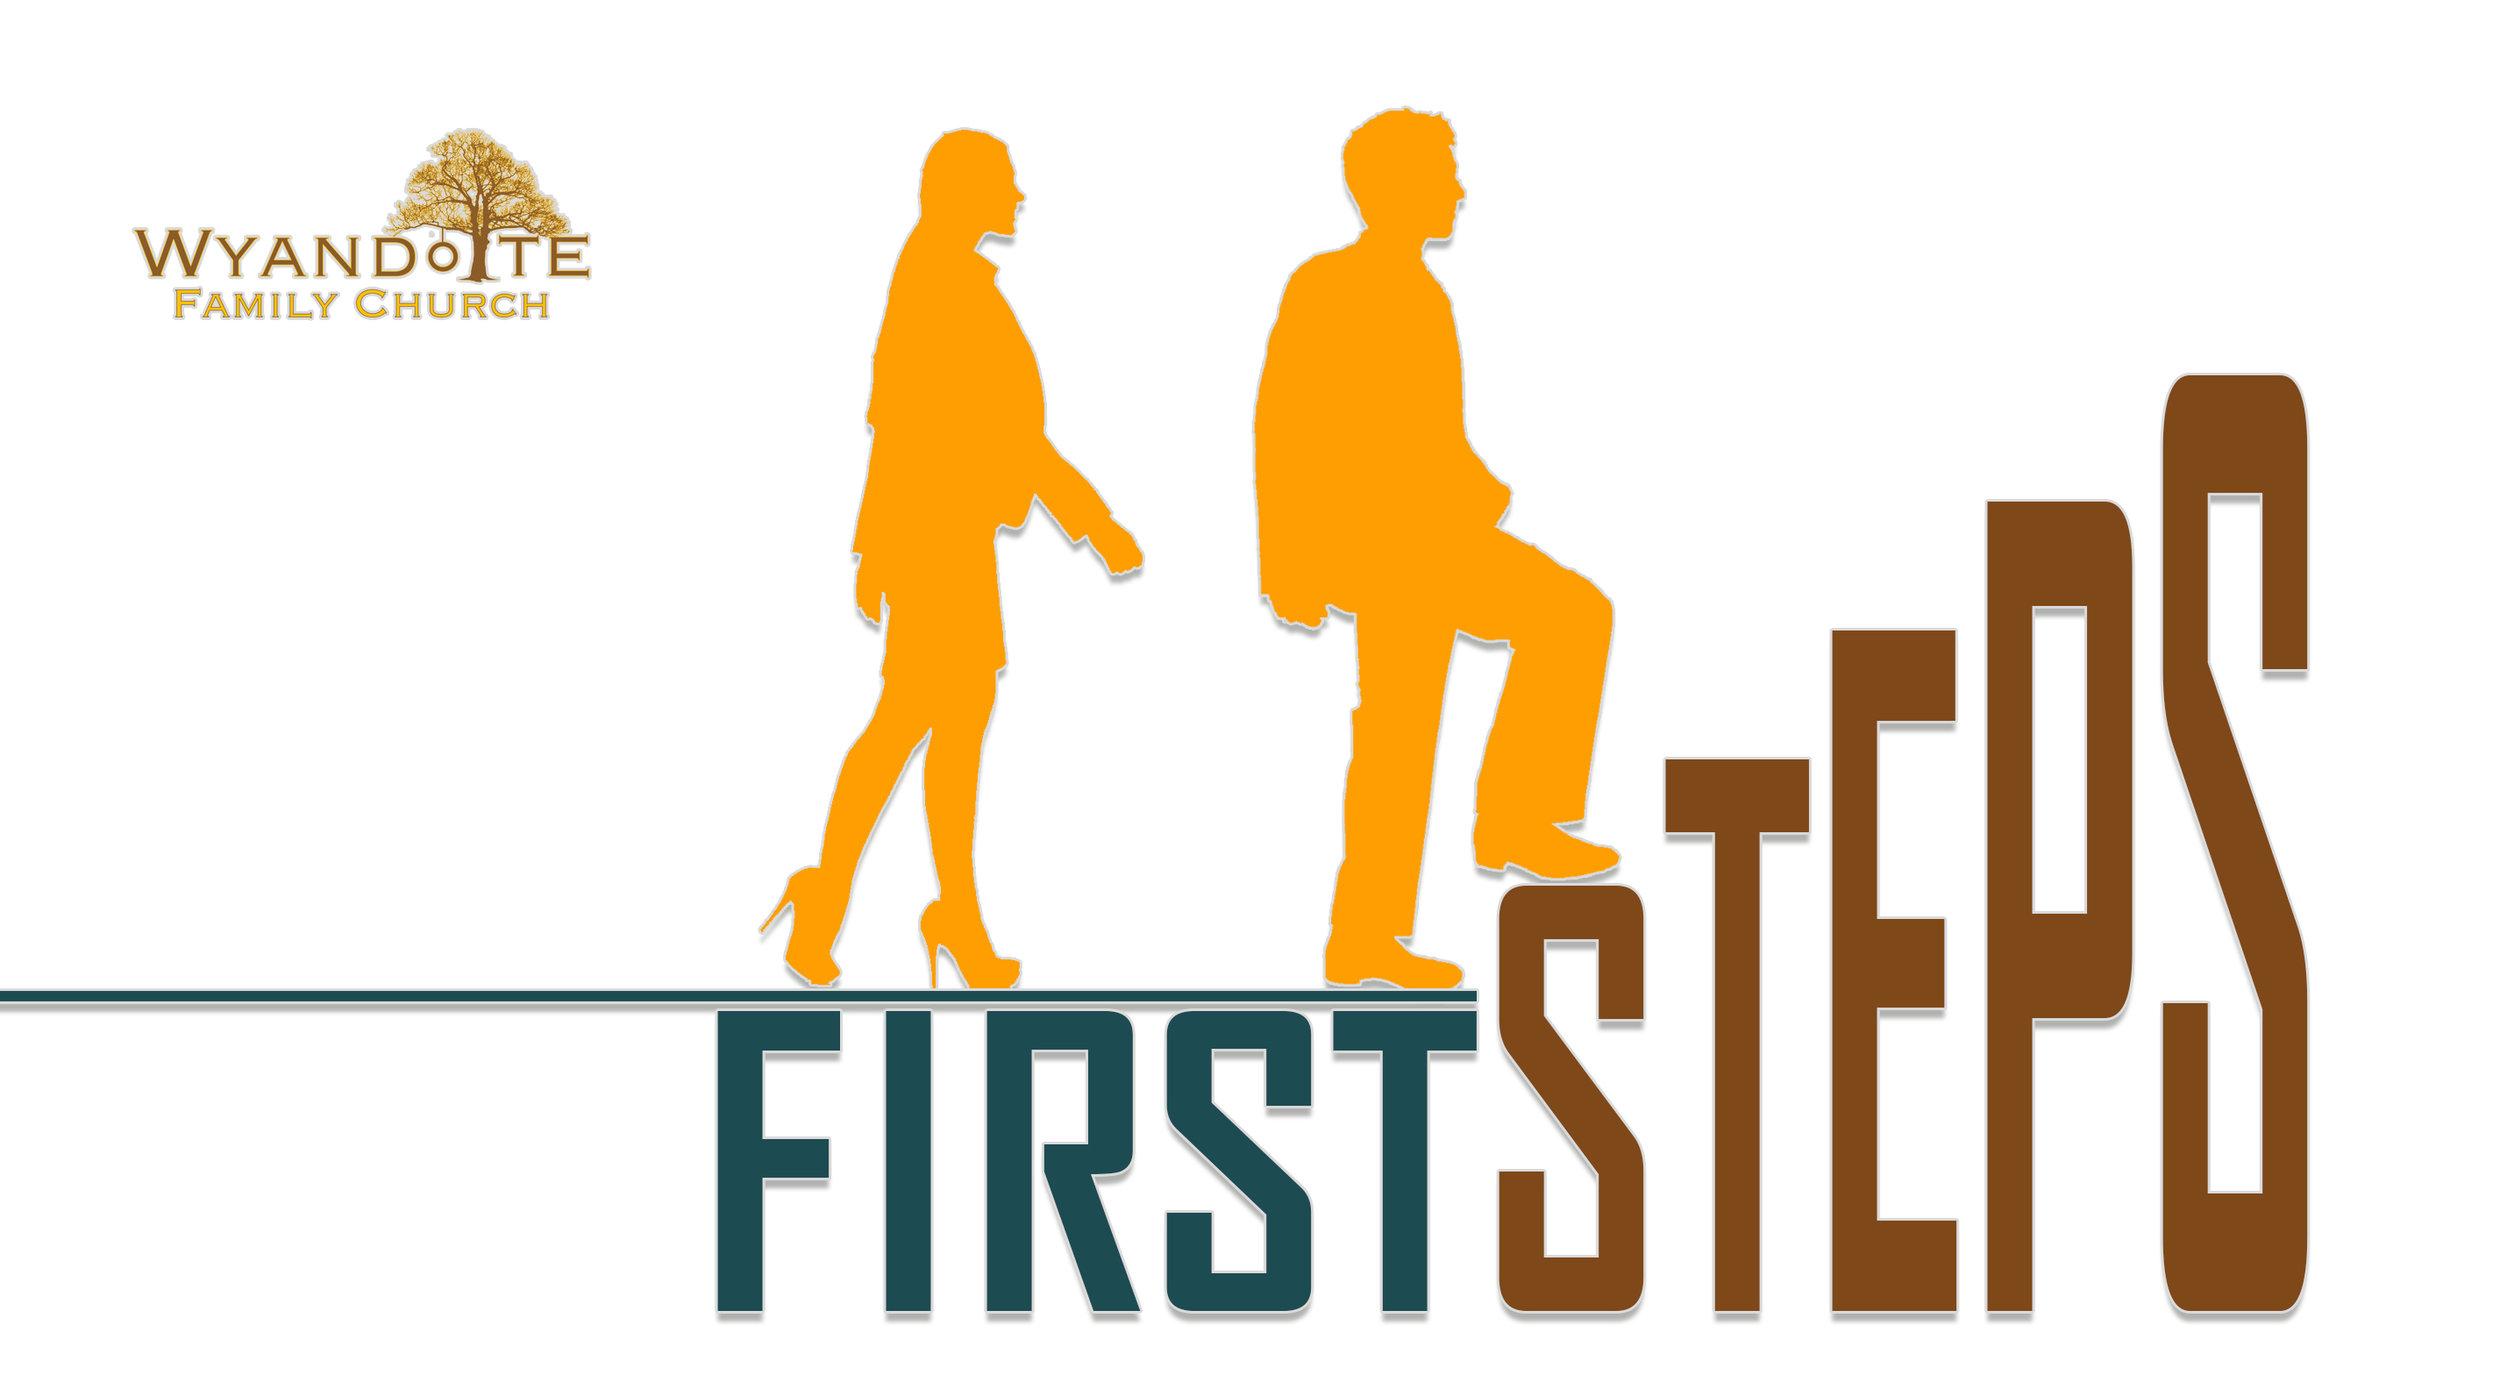 firststepsLOGO3.jpg